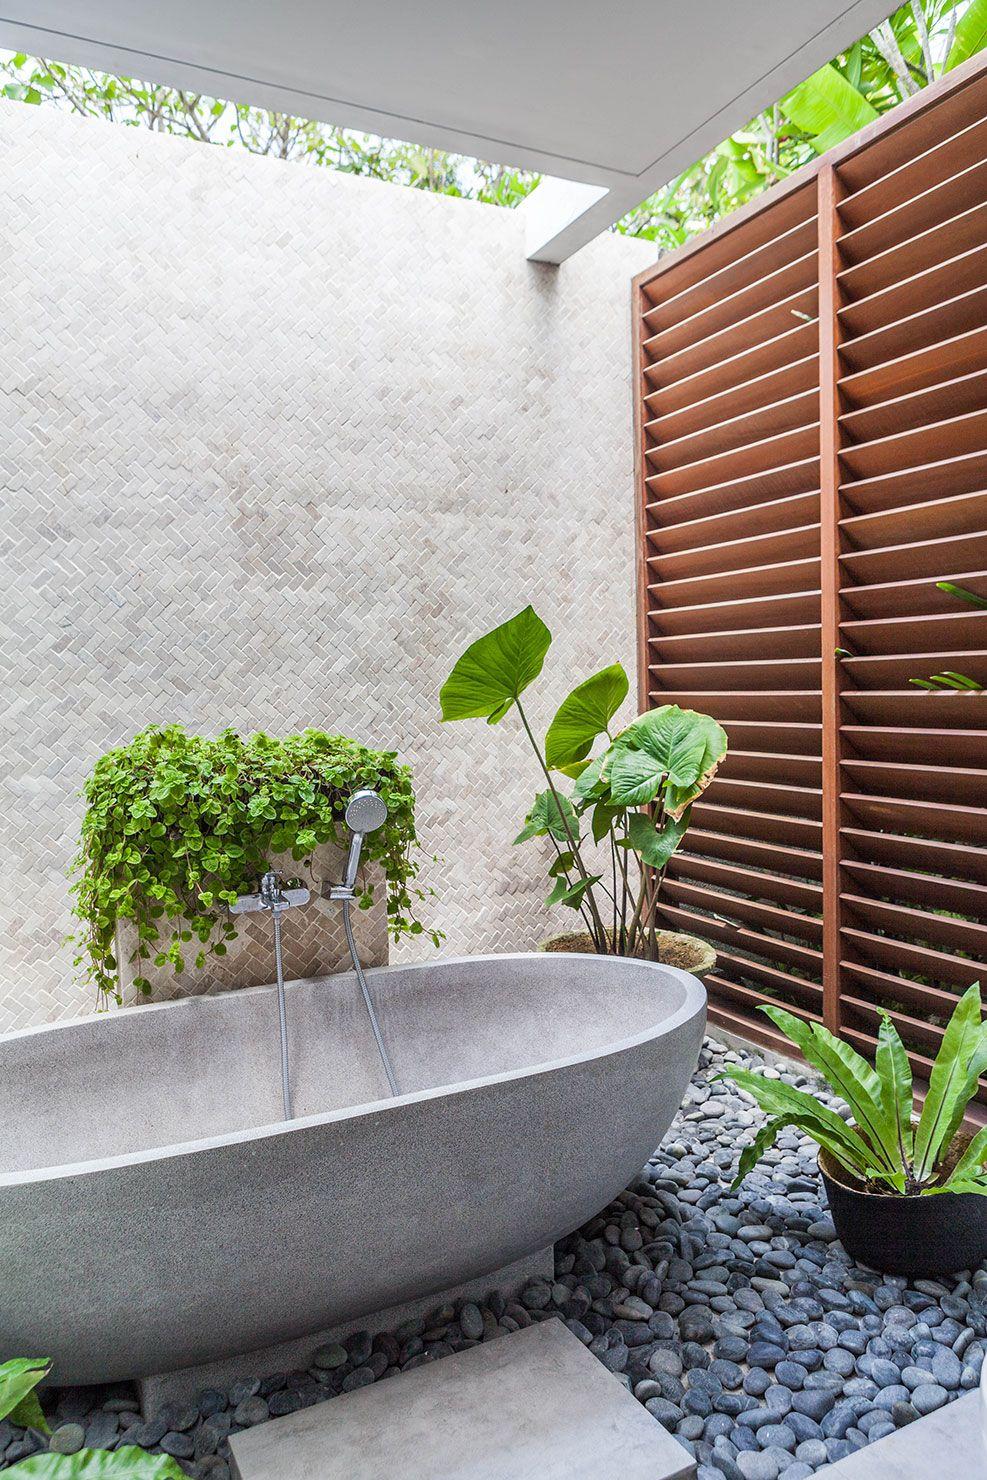 Home Bali Interiors Outdoor Bathroom Design Bali Interiors Indoor Outdoor Bathroom Caprieze fresso bathroom design